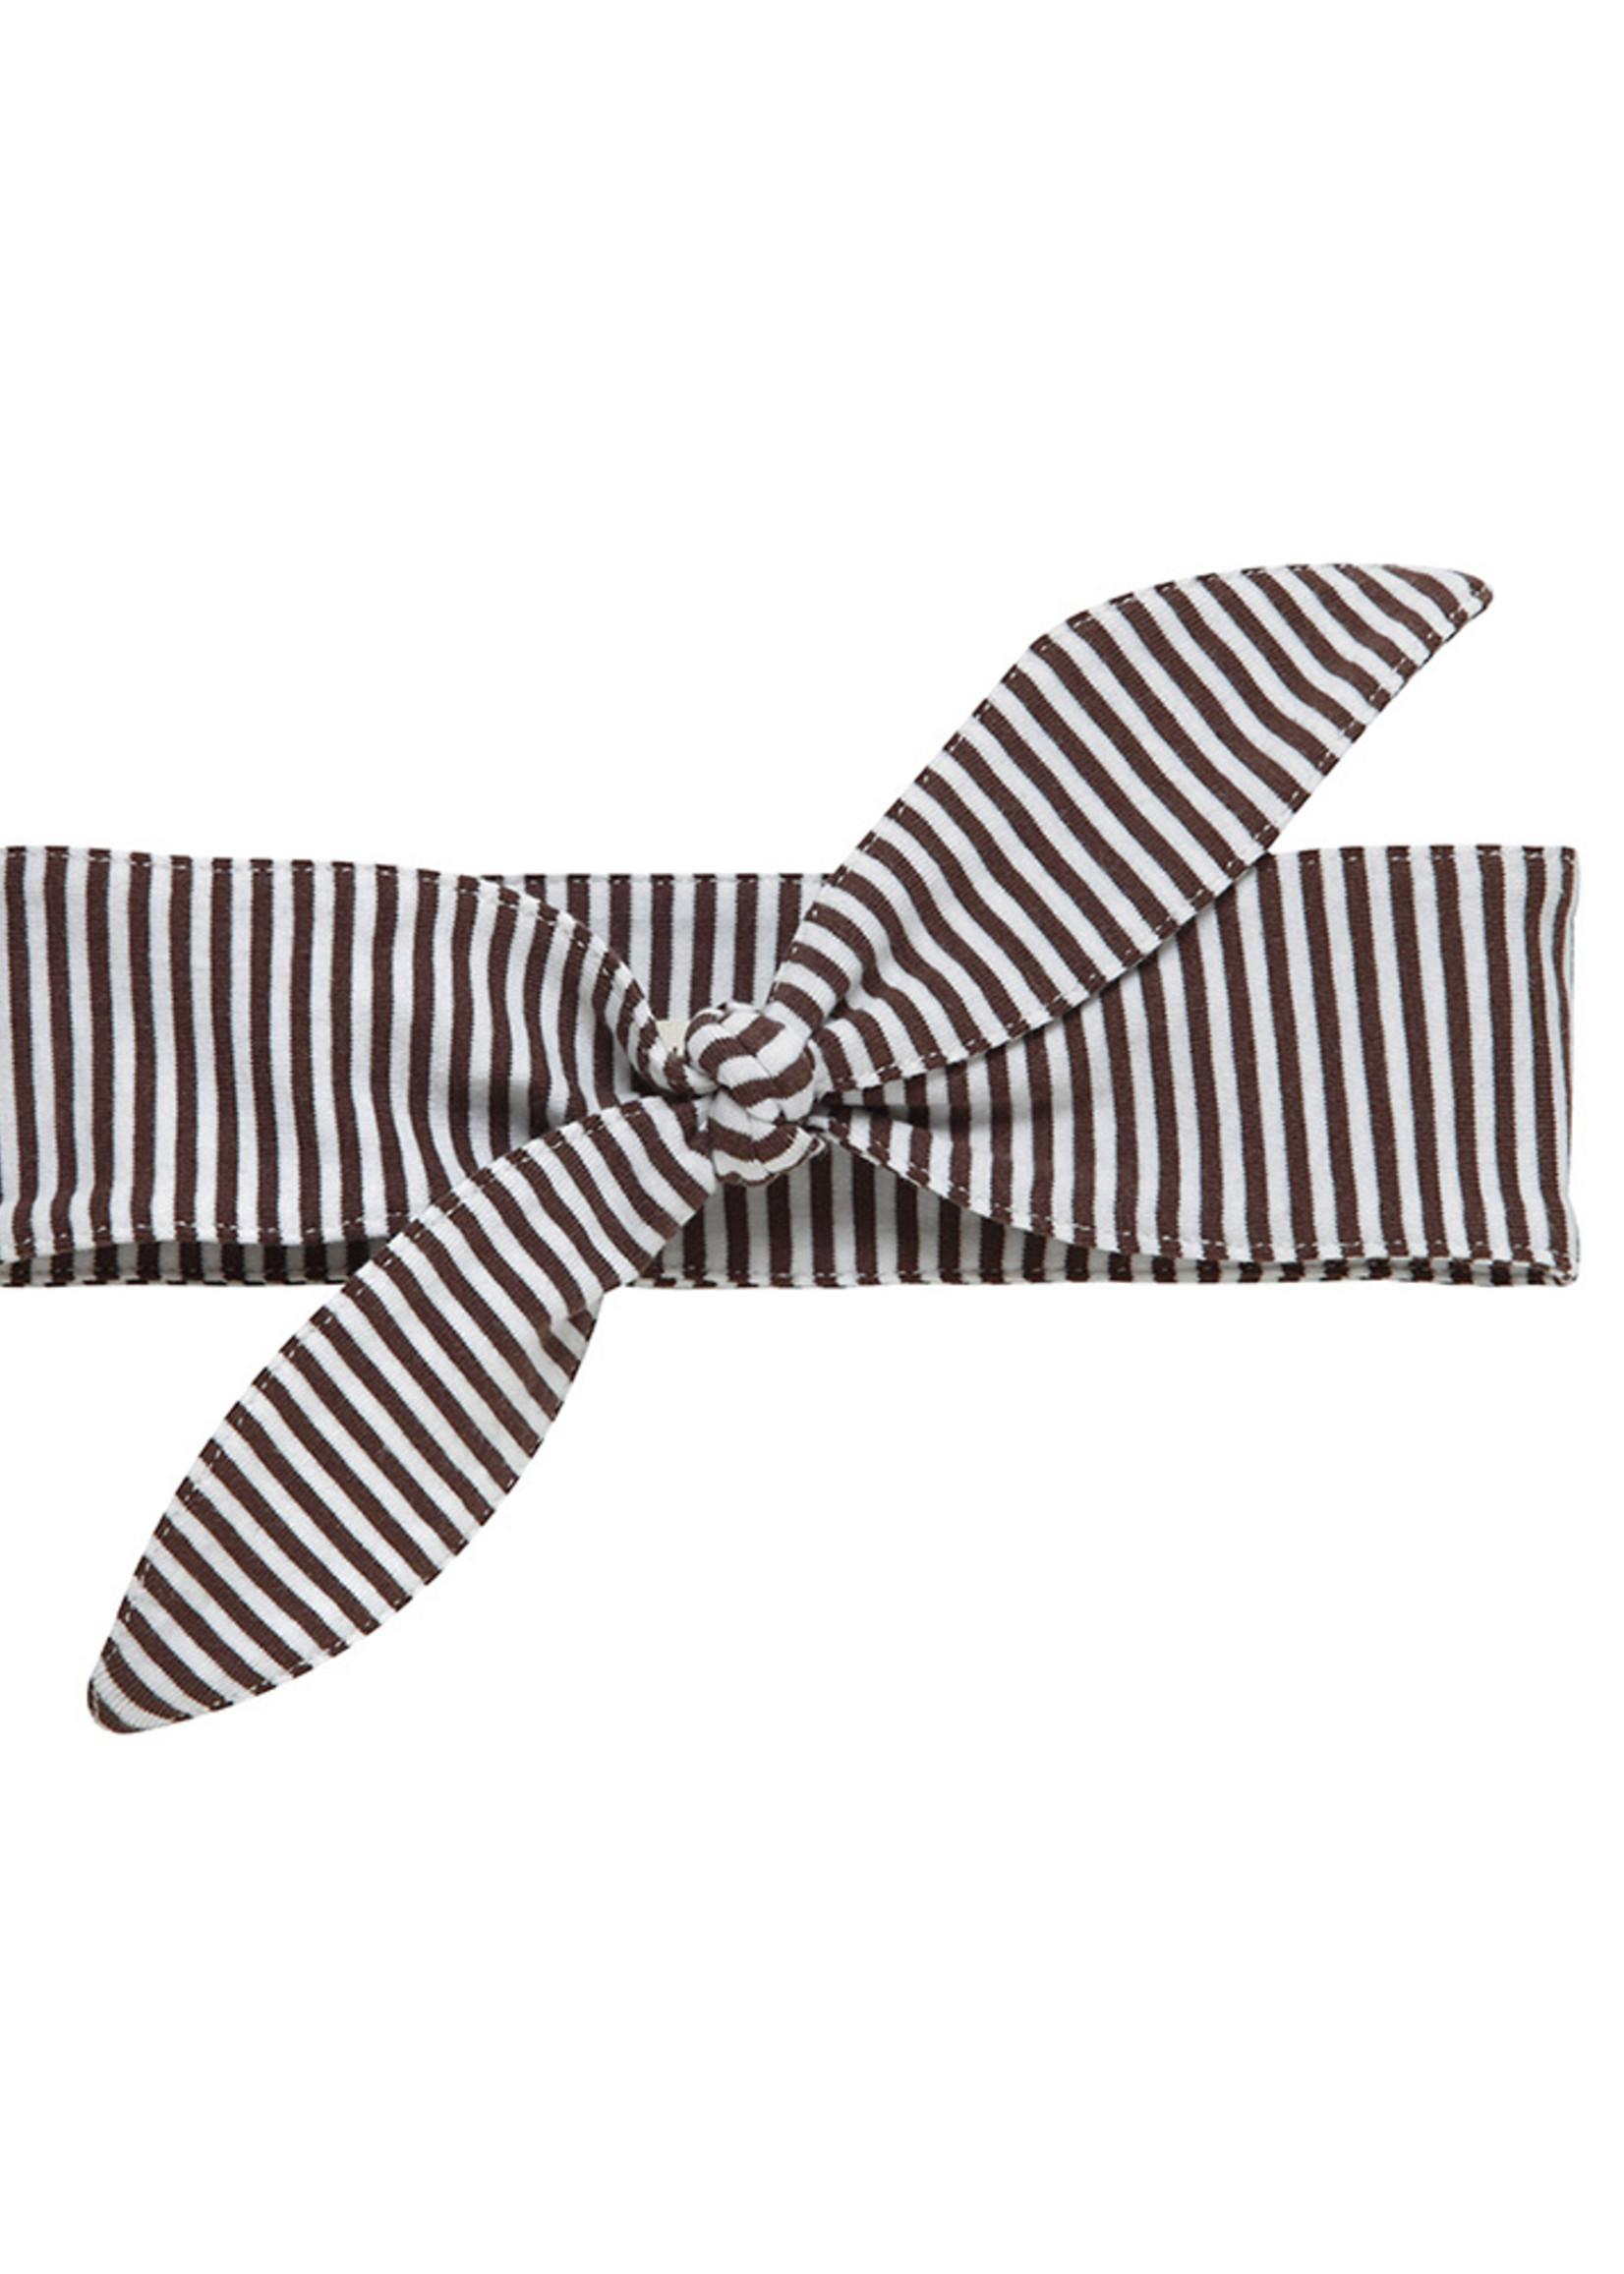 Little Indians LI - Headband - Brown Stripe